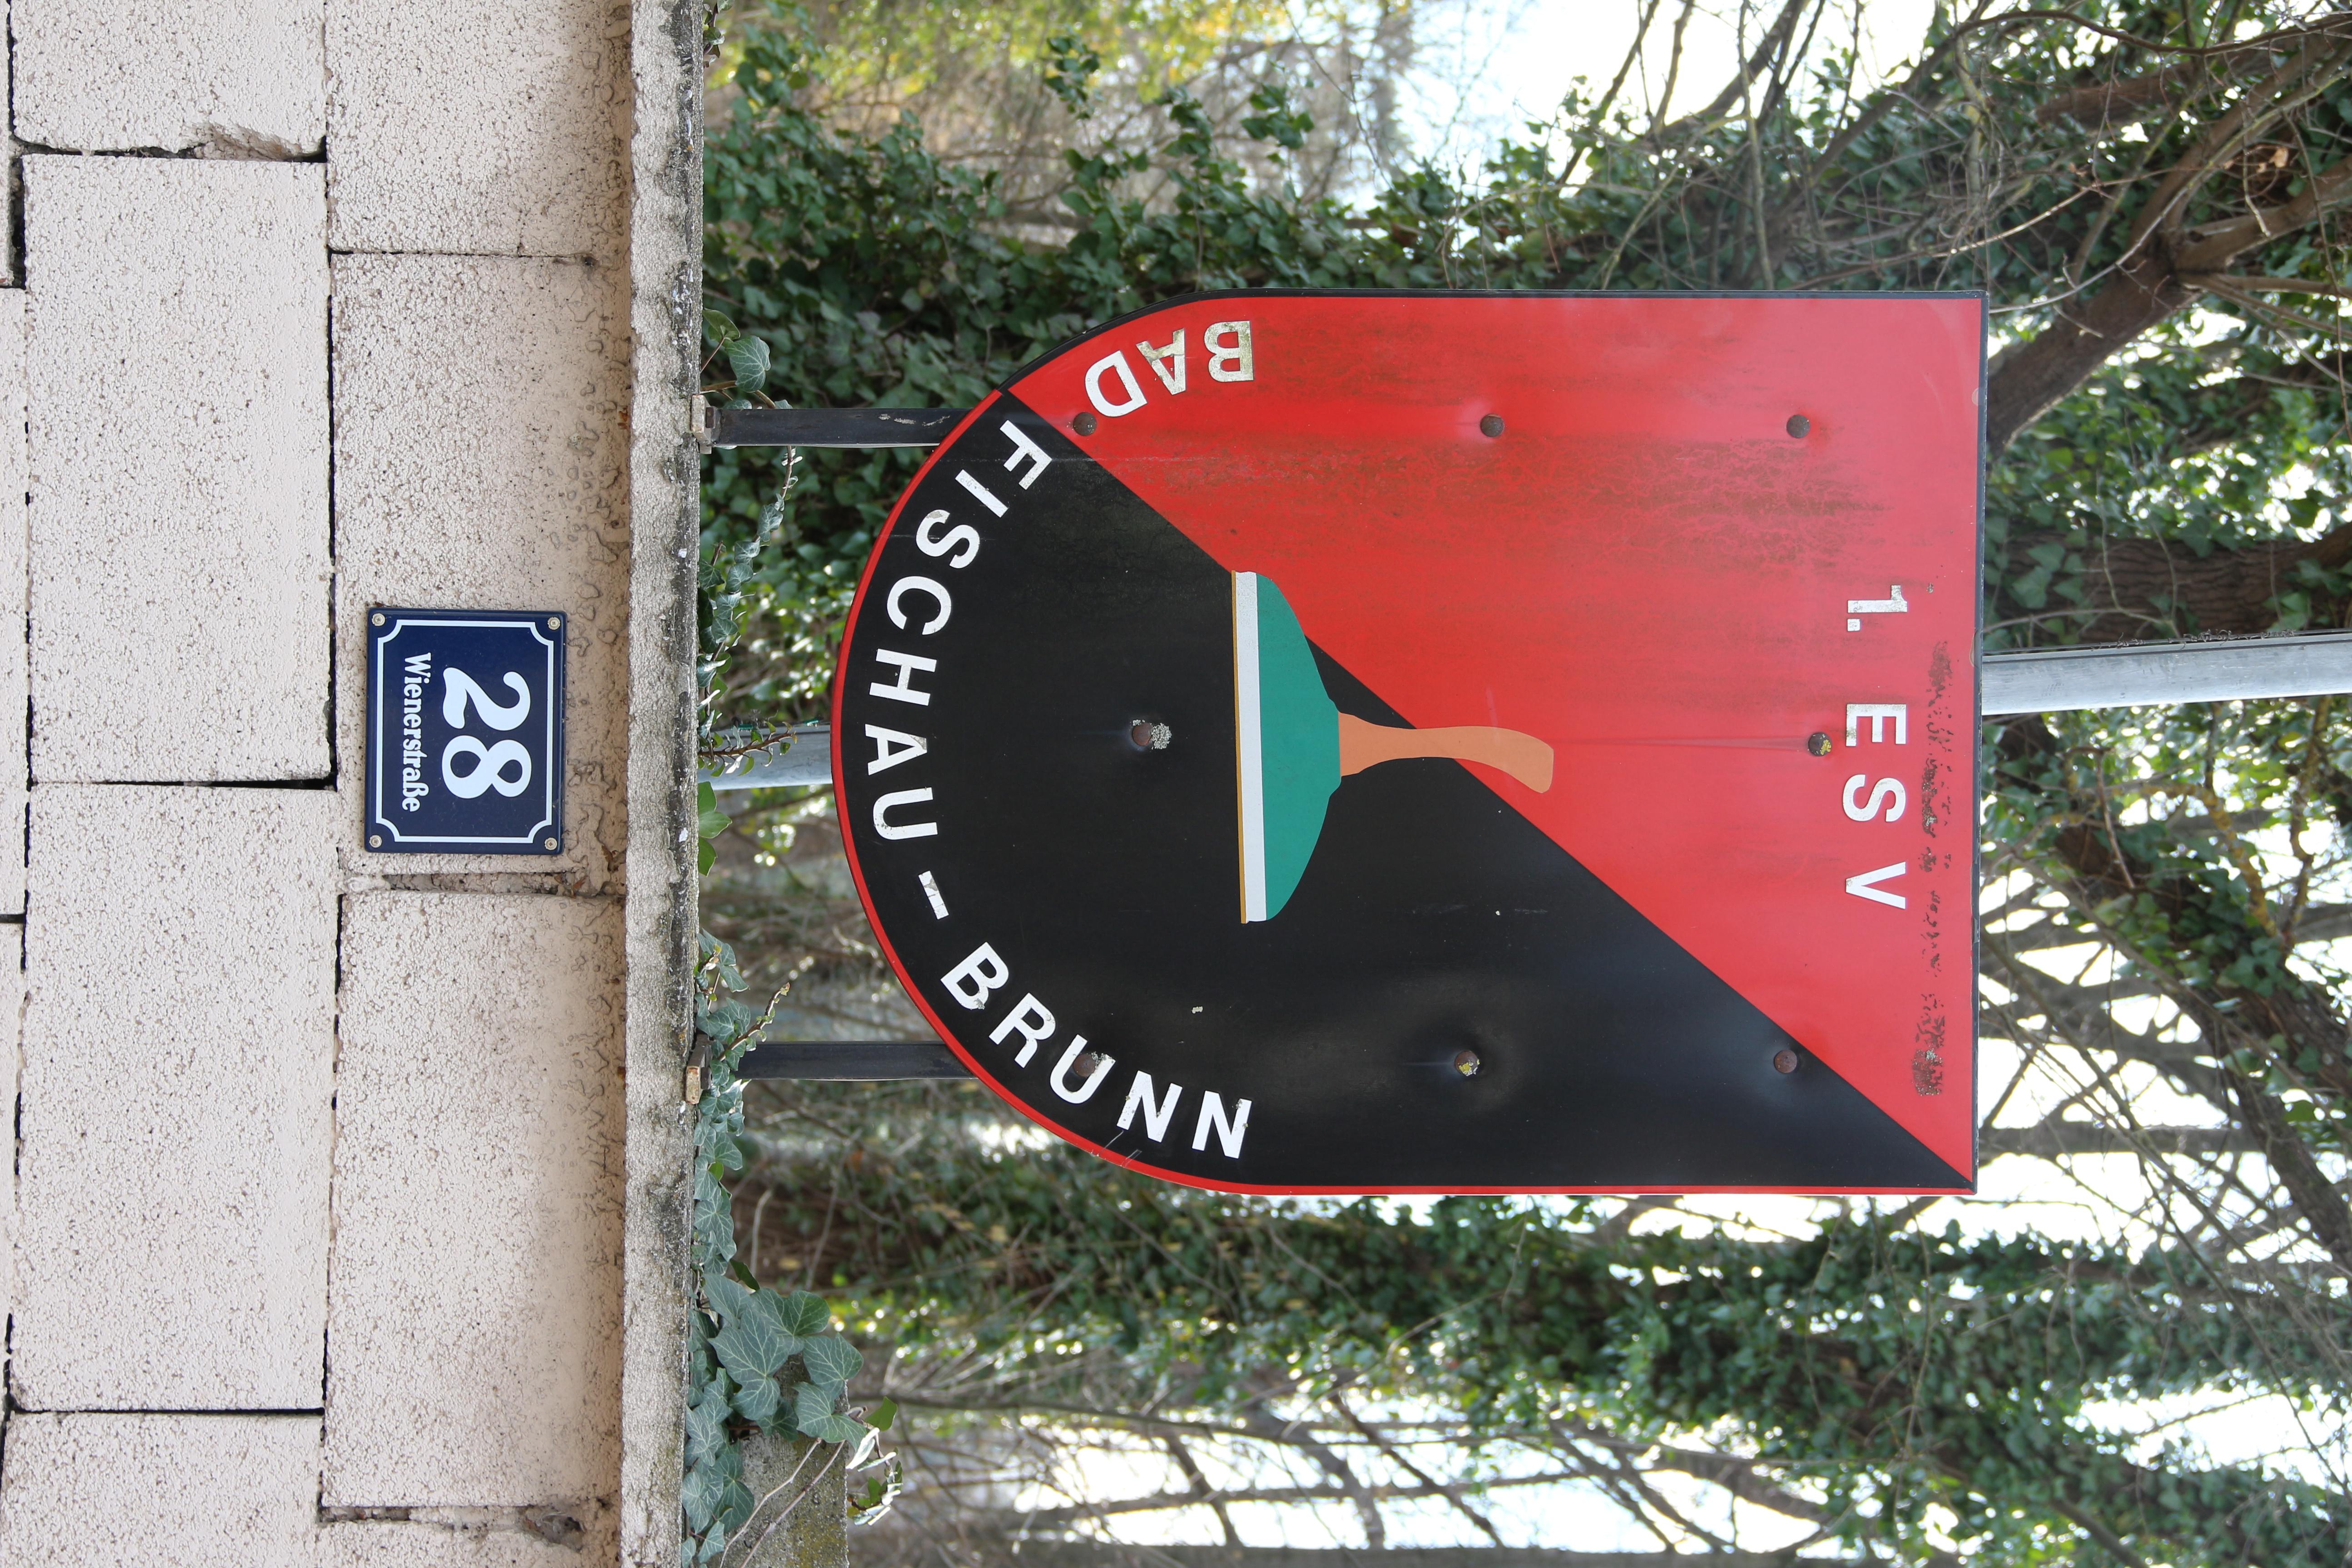 Sauna Bad Fischau, Treff Fr Singles Linz - Casual Dating